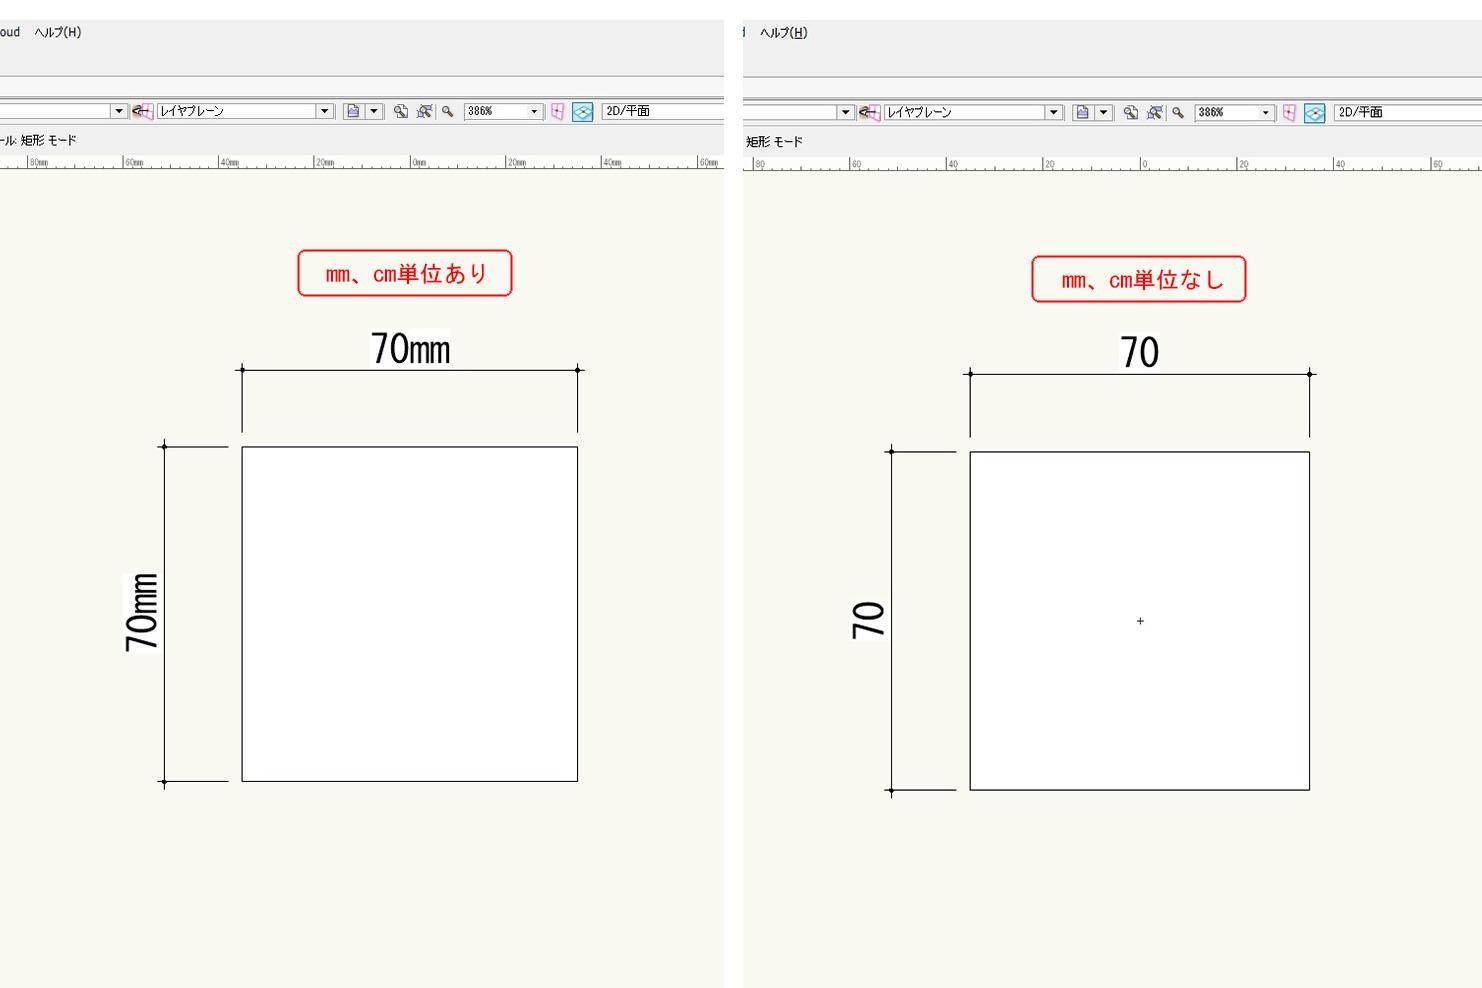 Vectorworksで寸法にmmやcmの単位をつける方法、外す方法